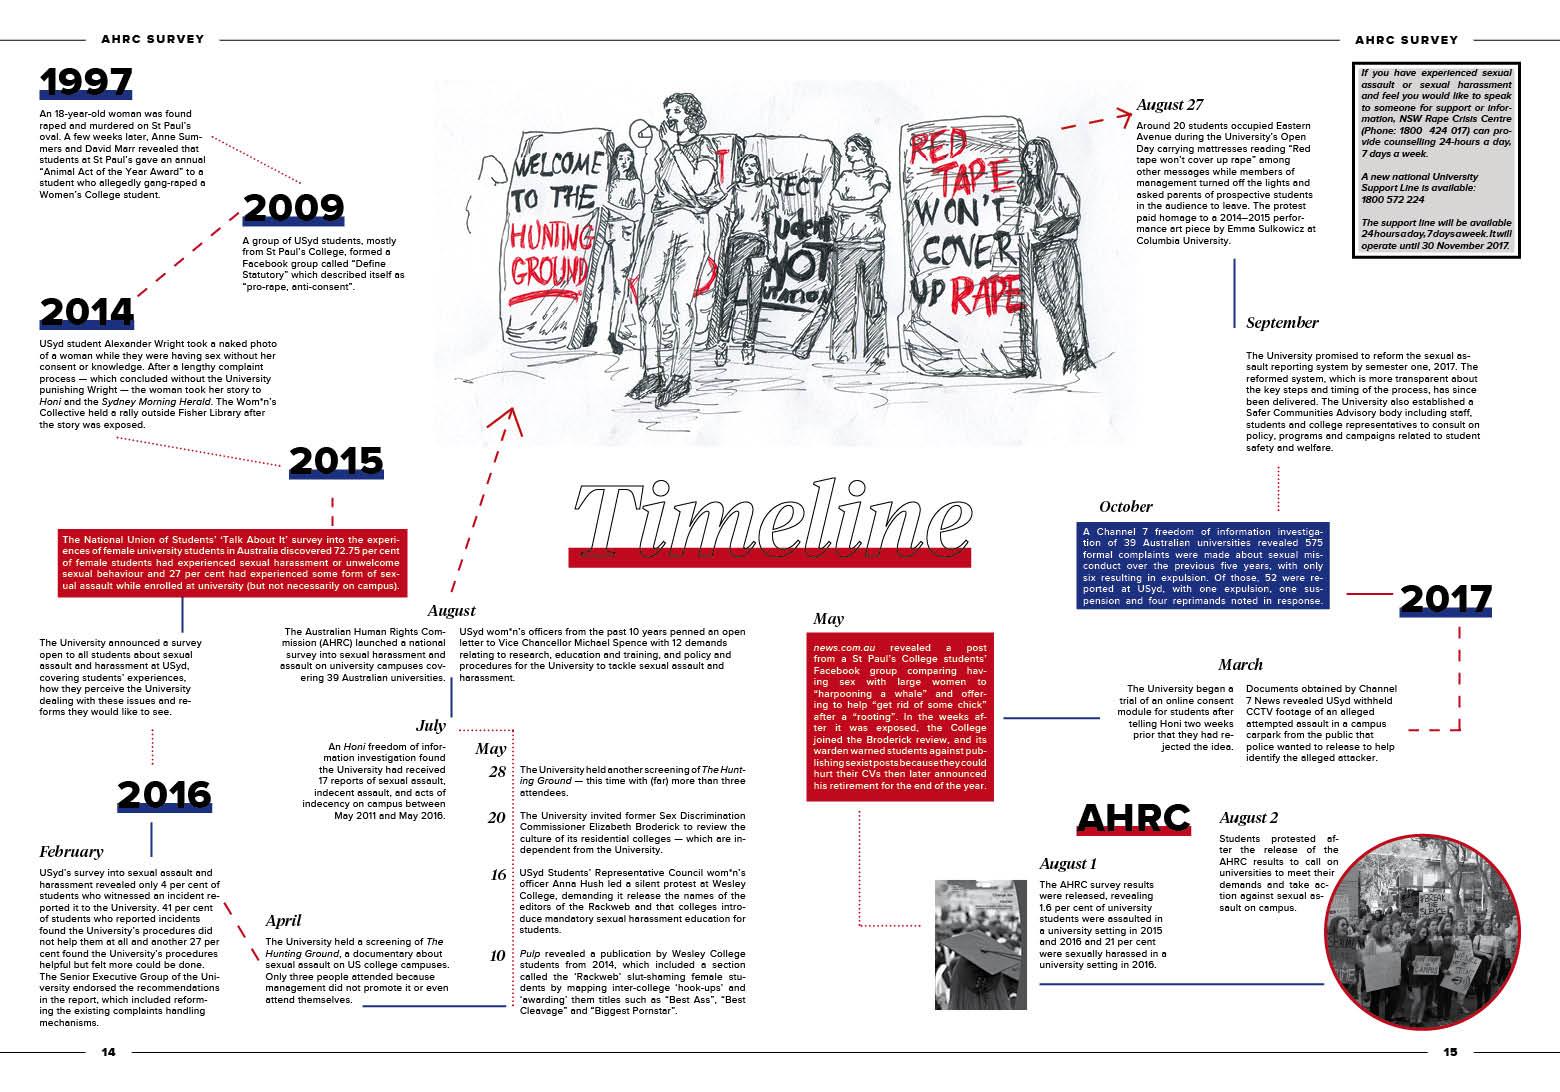 AHRC Timeline